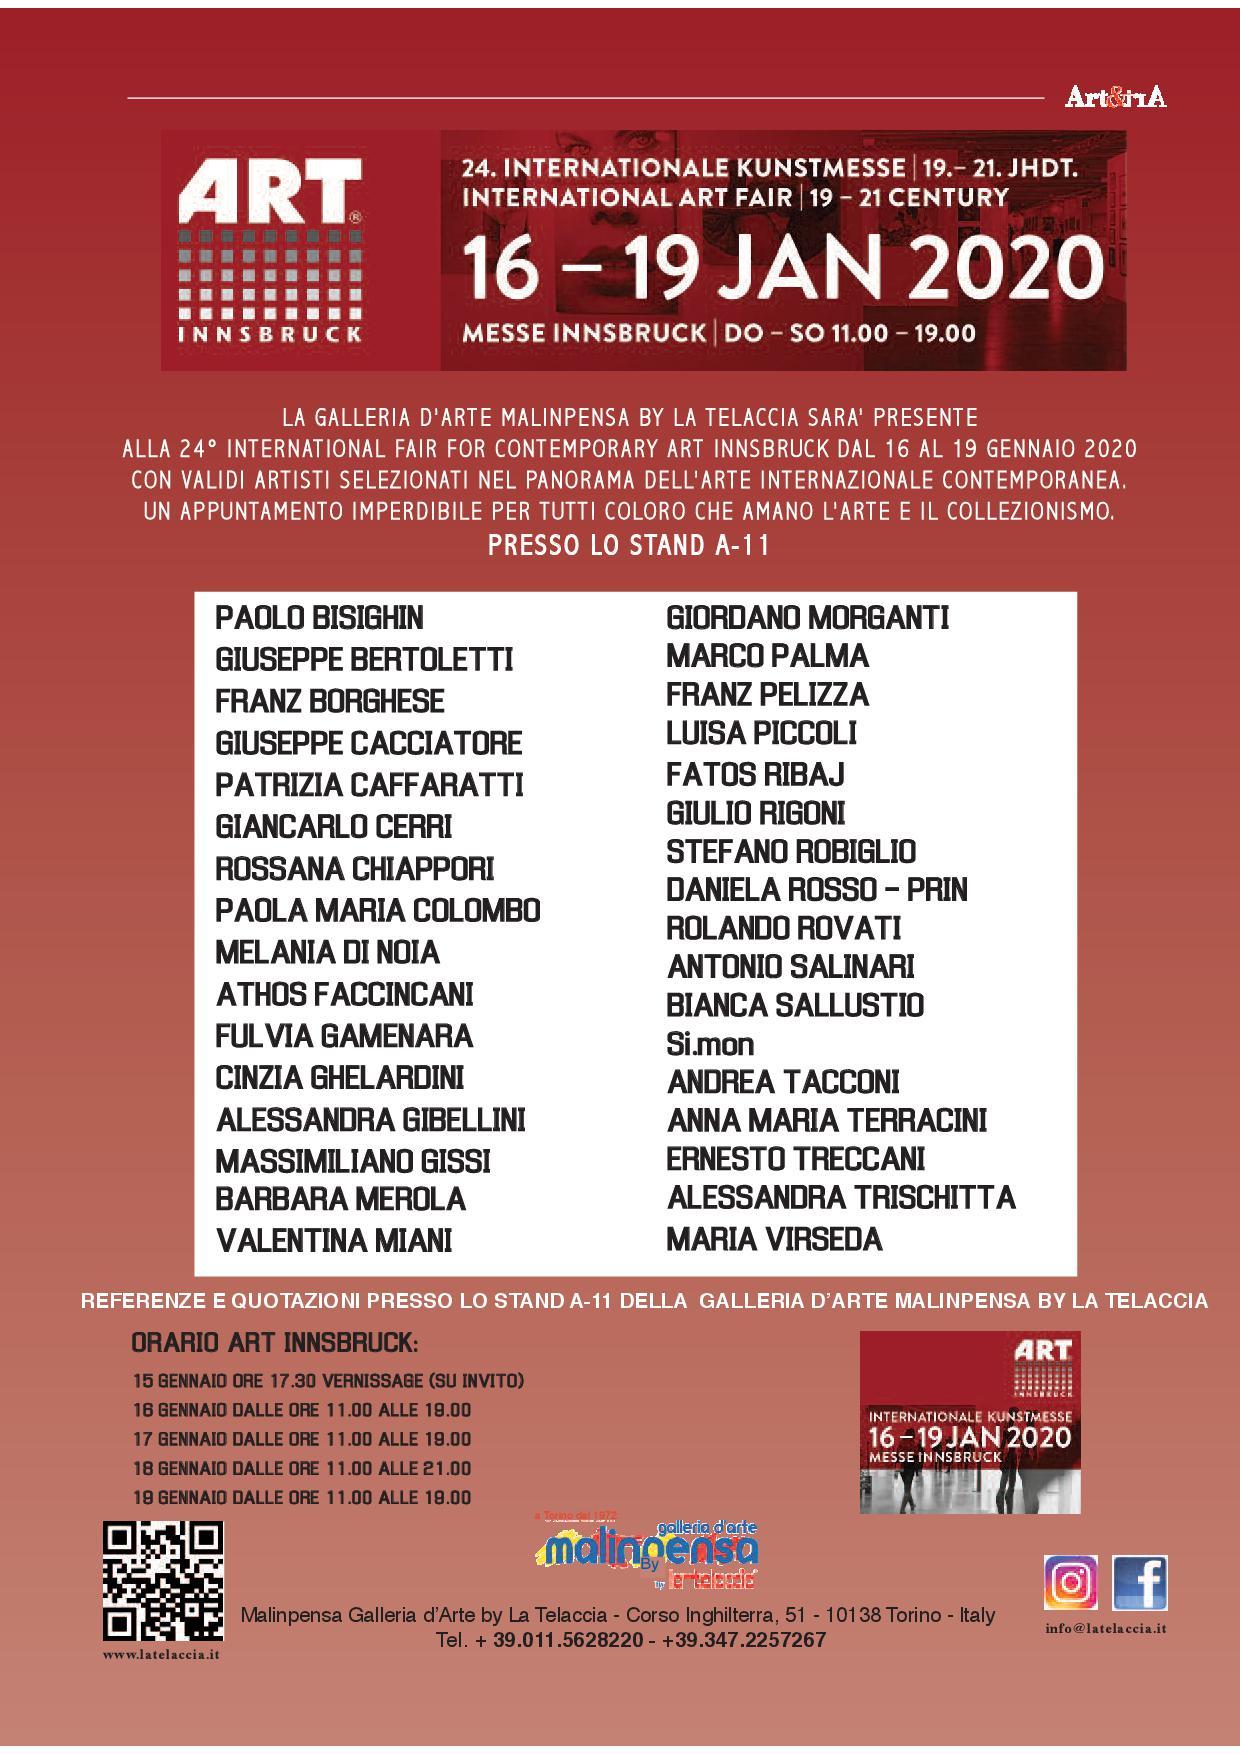 ART & ART DICEMBRE 2020.jpg